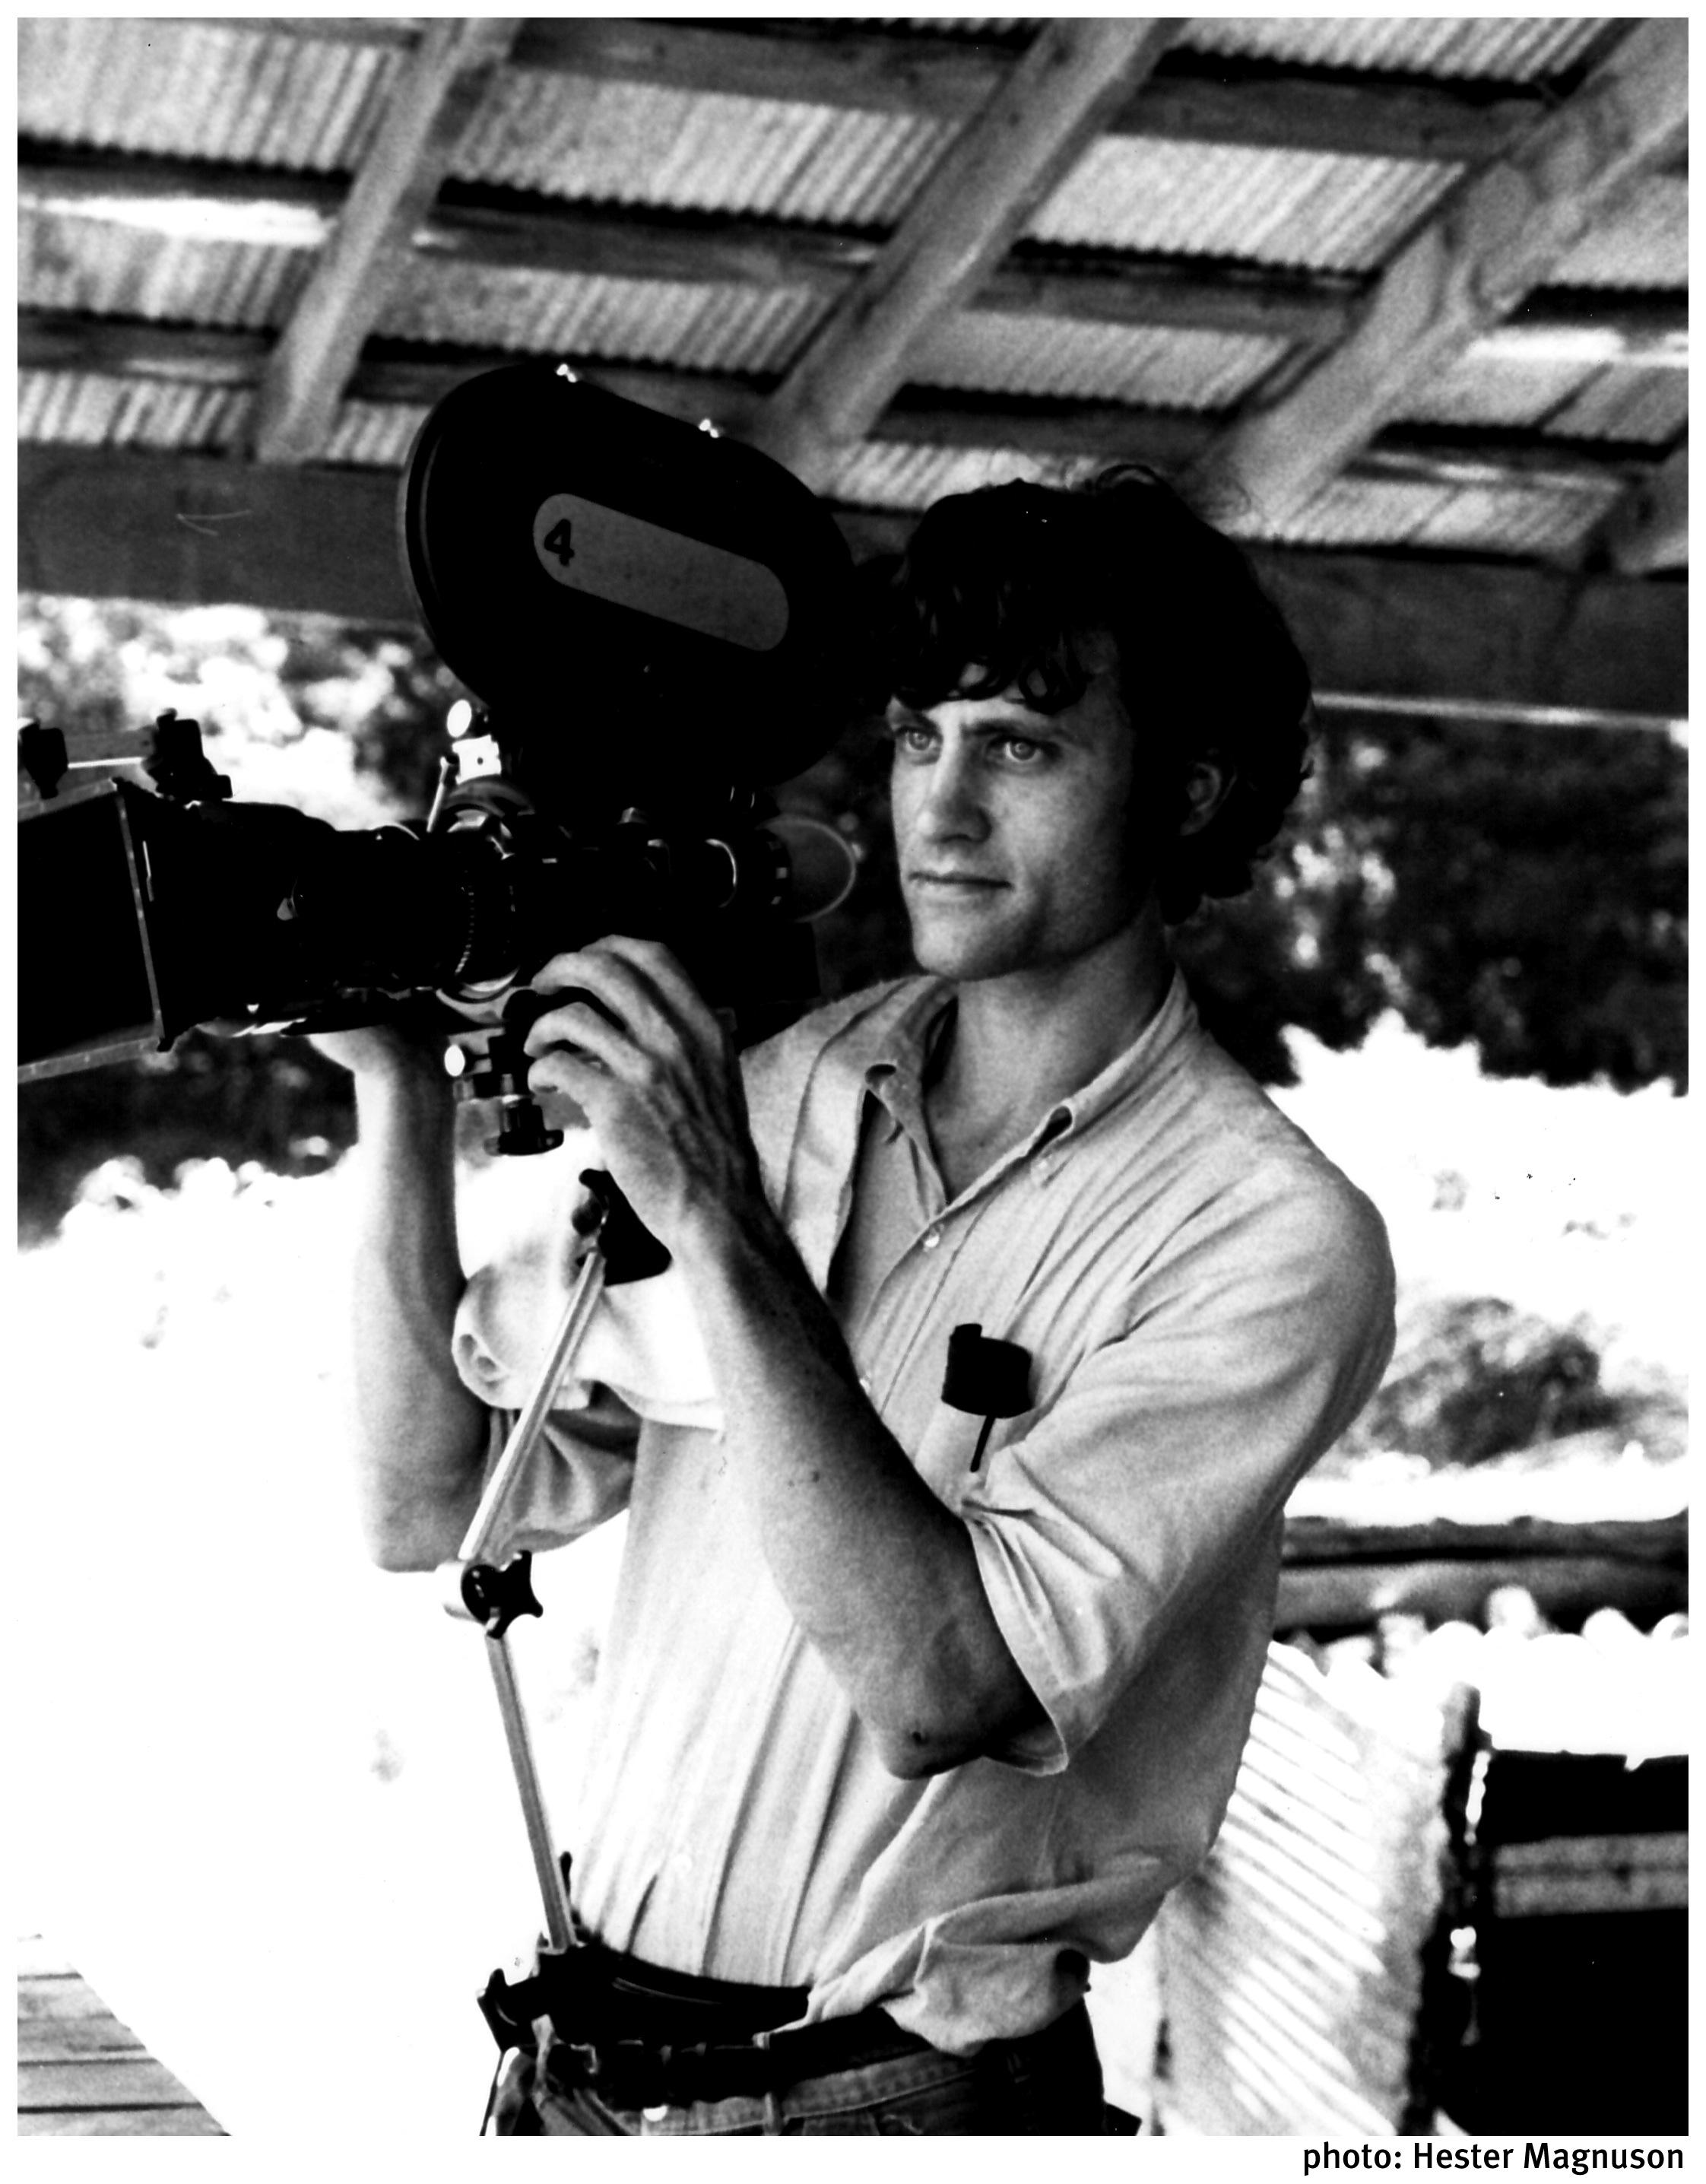 Bill Ferris in the 1970s